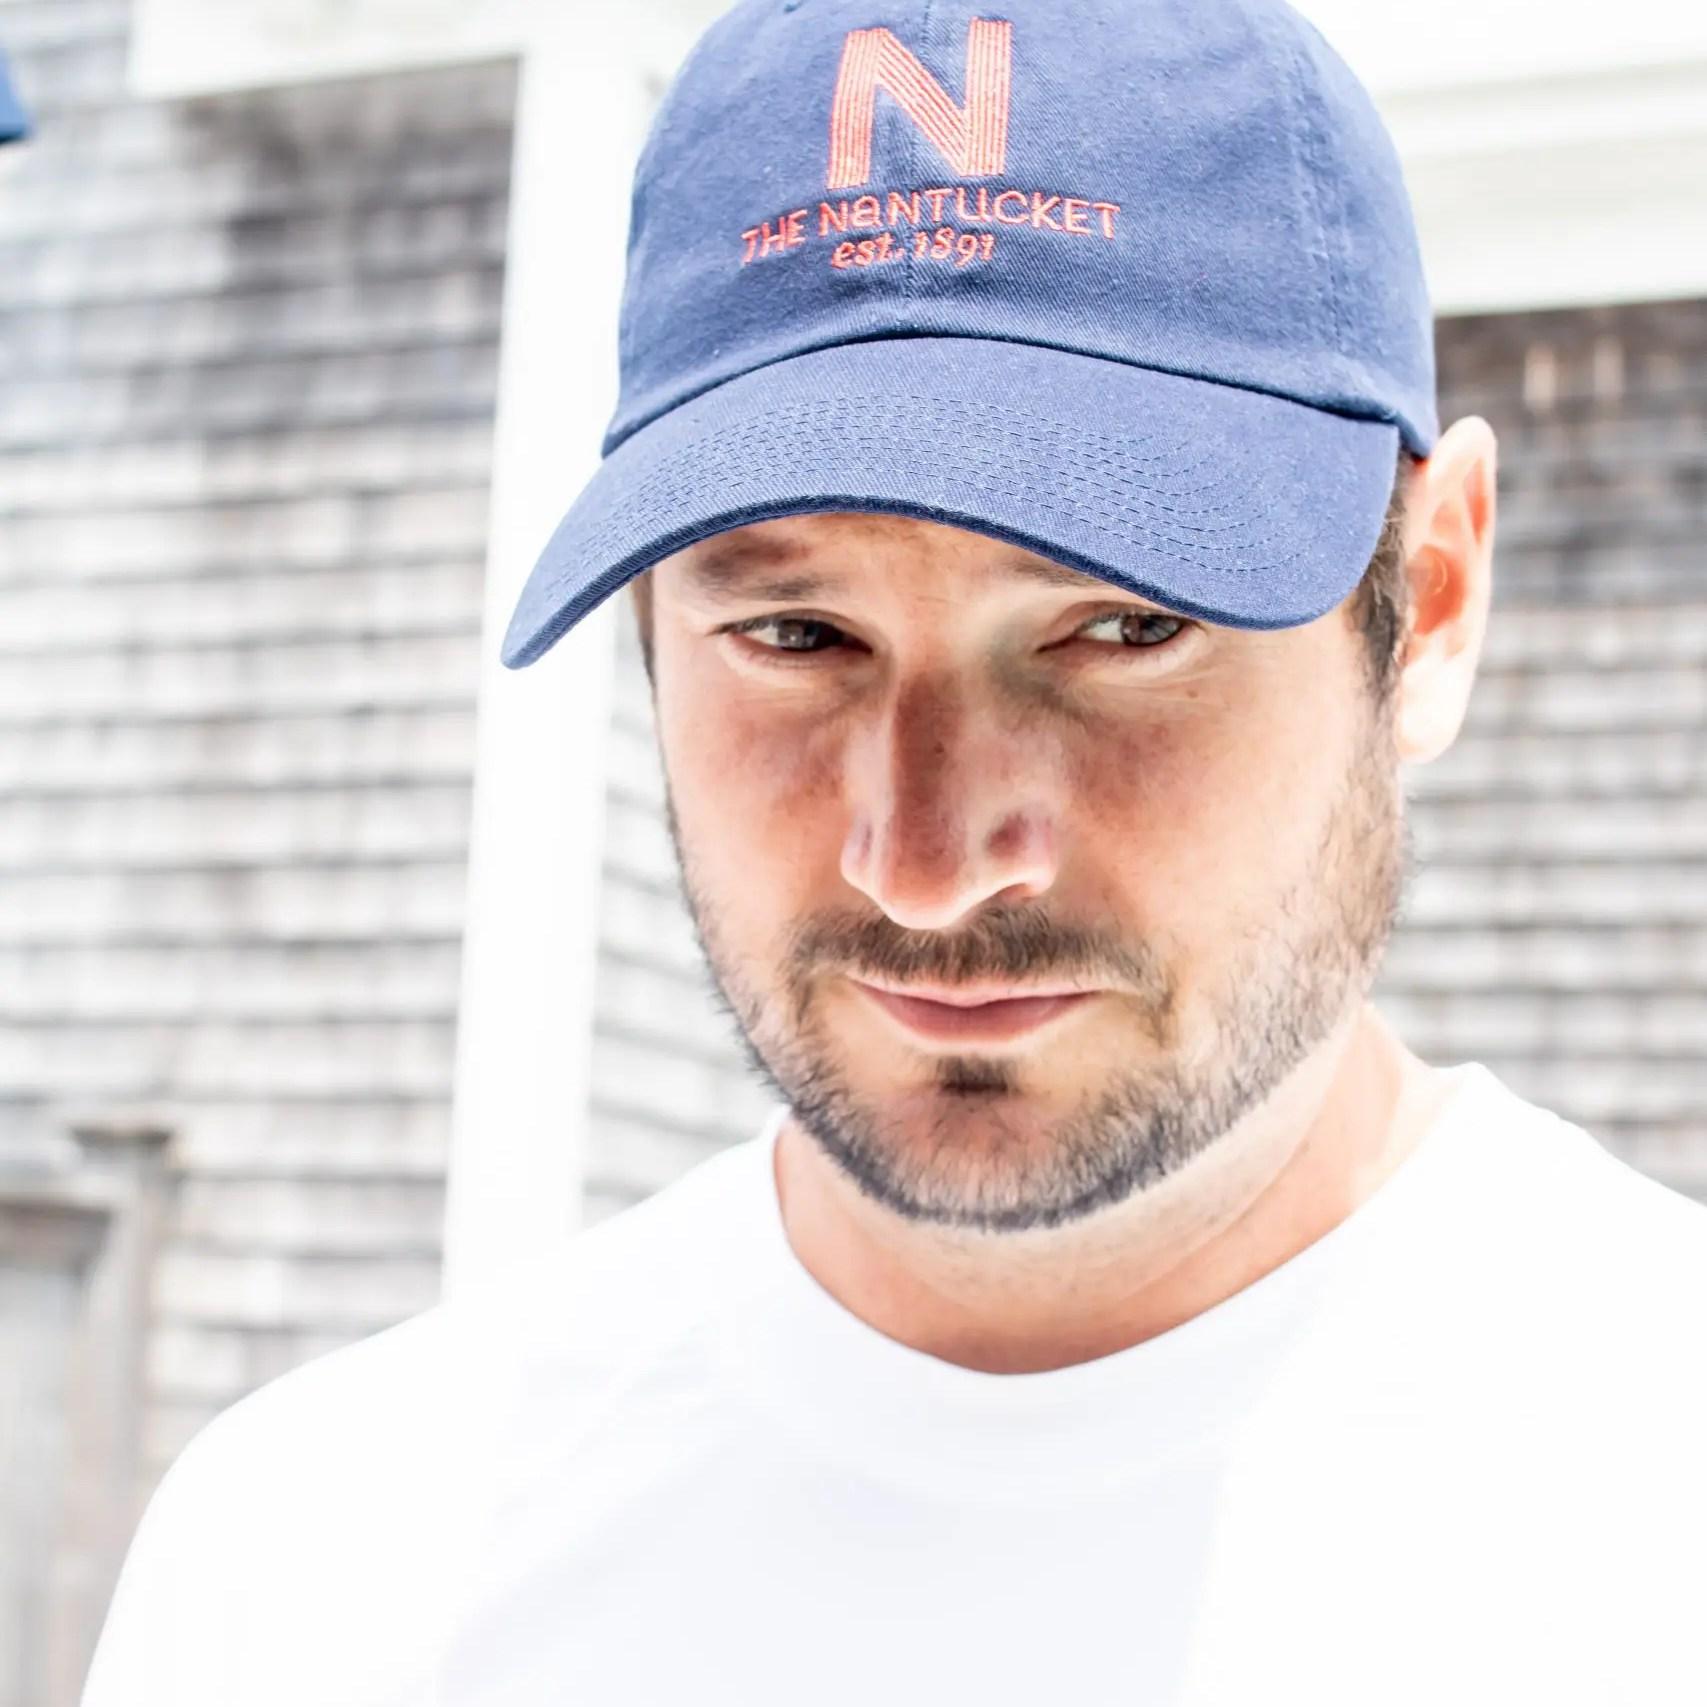 Man wearing Nantucket Hotel hat and Cabana Life sun safe shirt